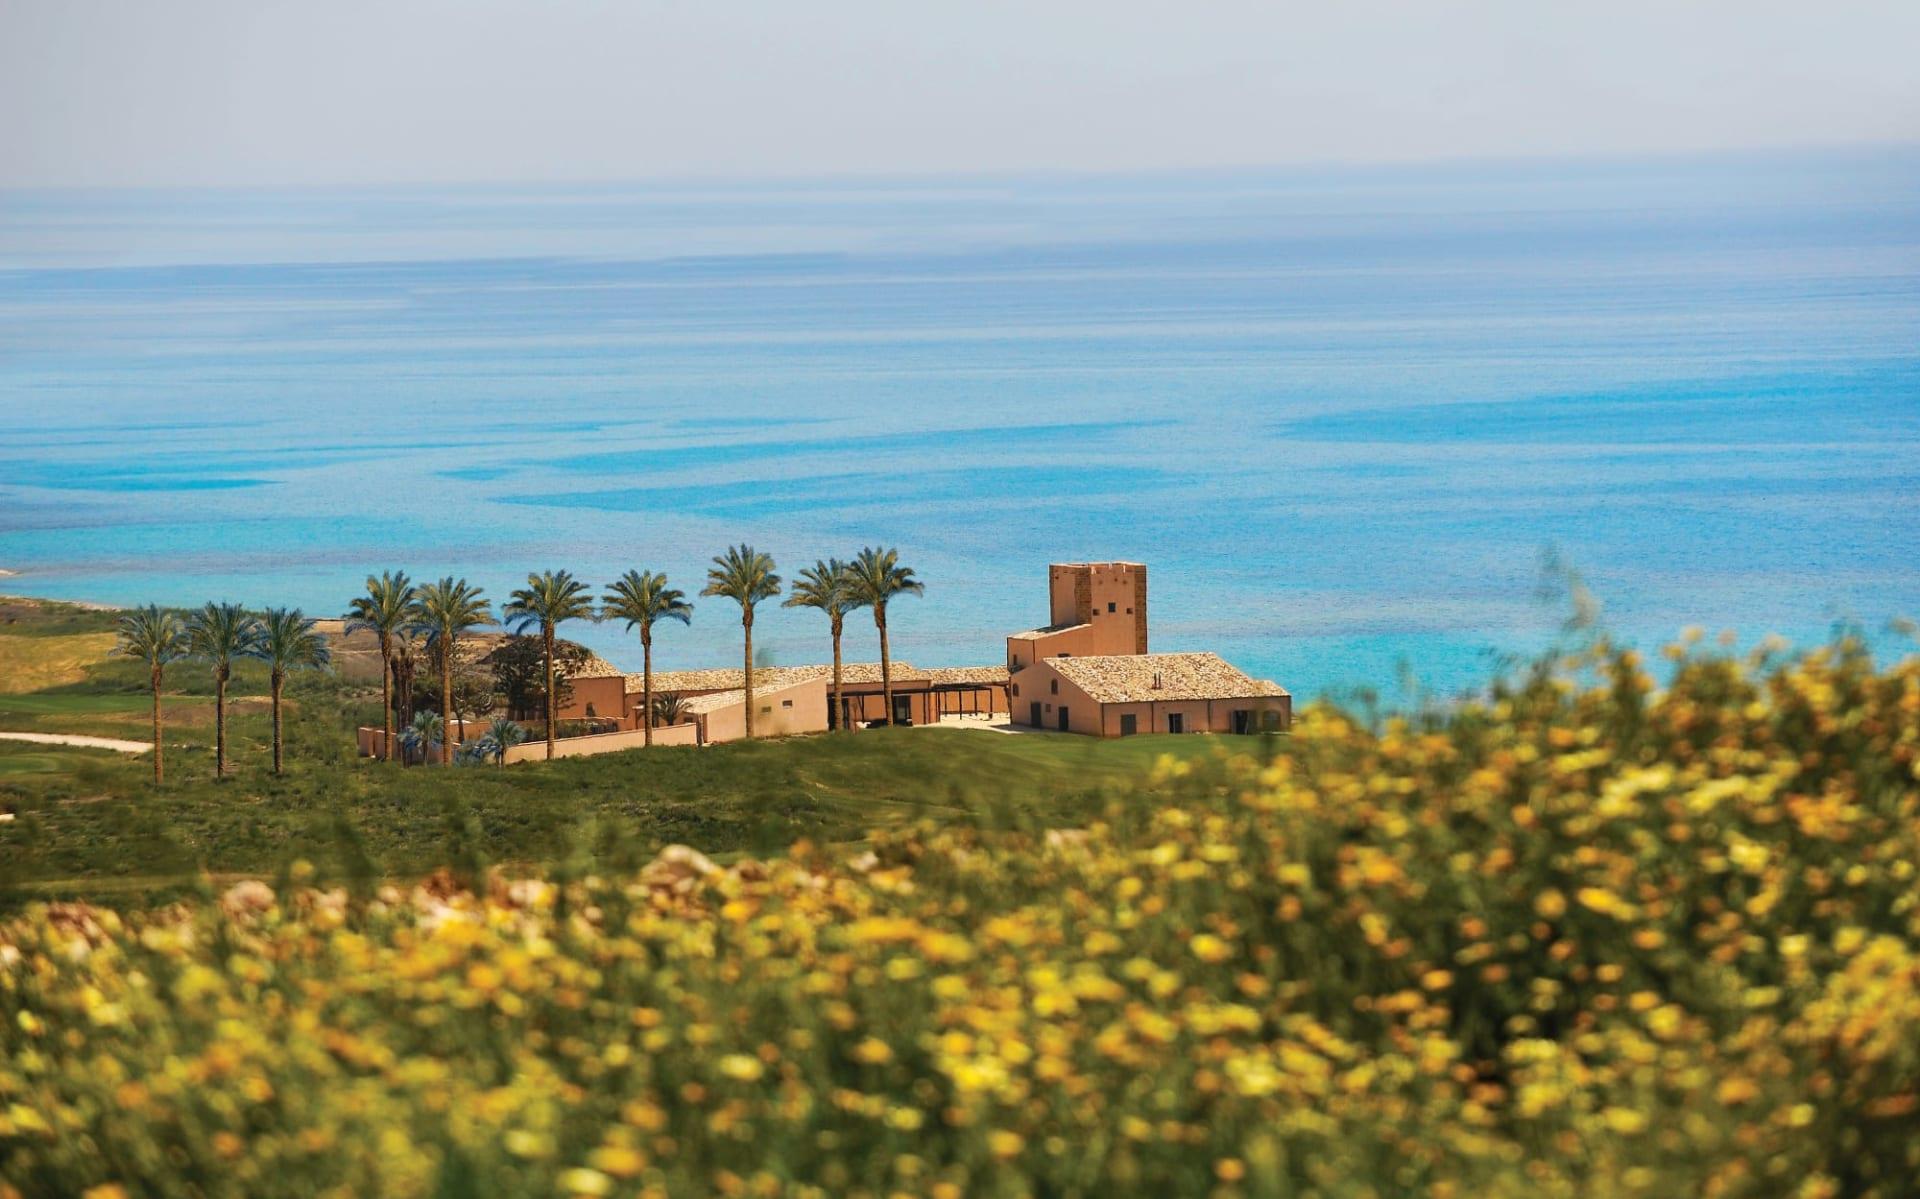 15.10. - 22.10.2021 Golf & Kultur auf Sizilien ab Catania: Verdura-Golf-&-Spa-Resort-4256x2832